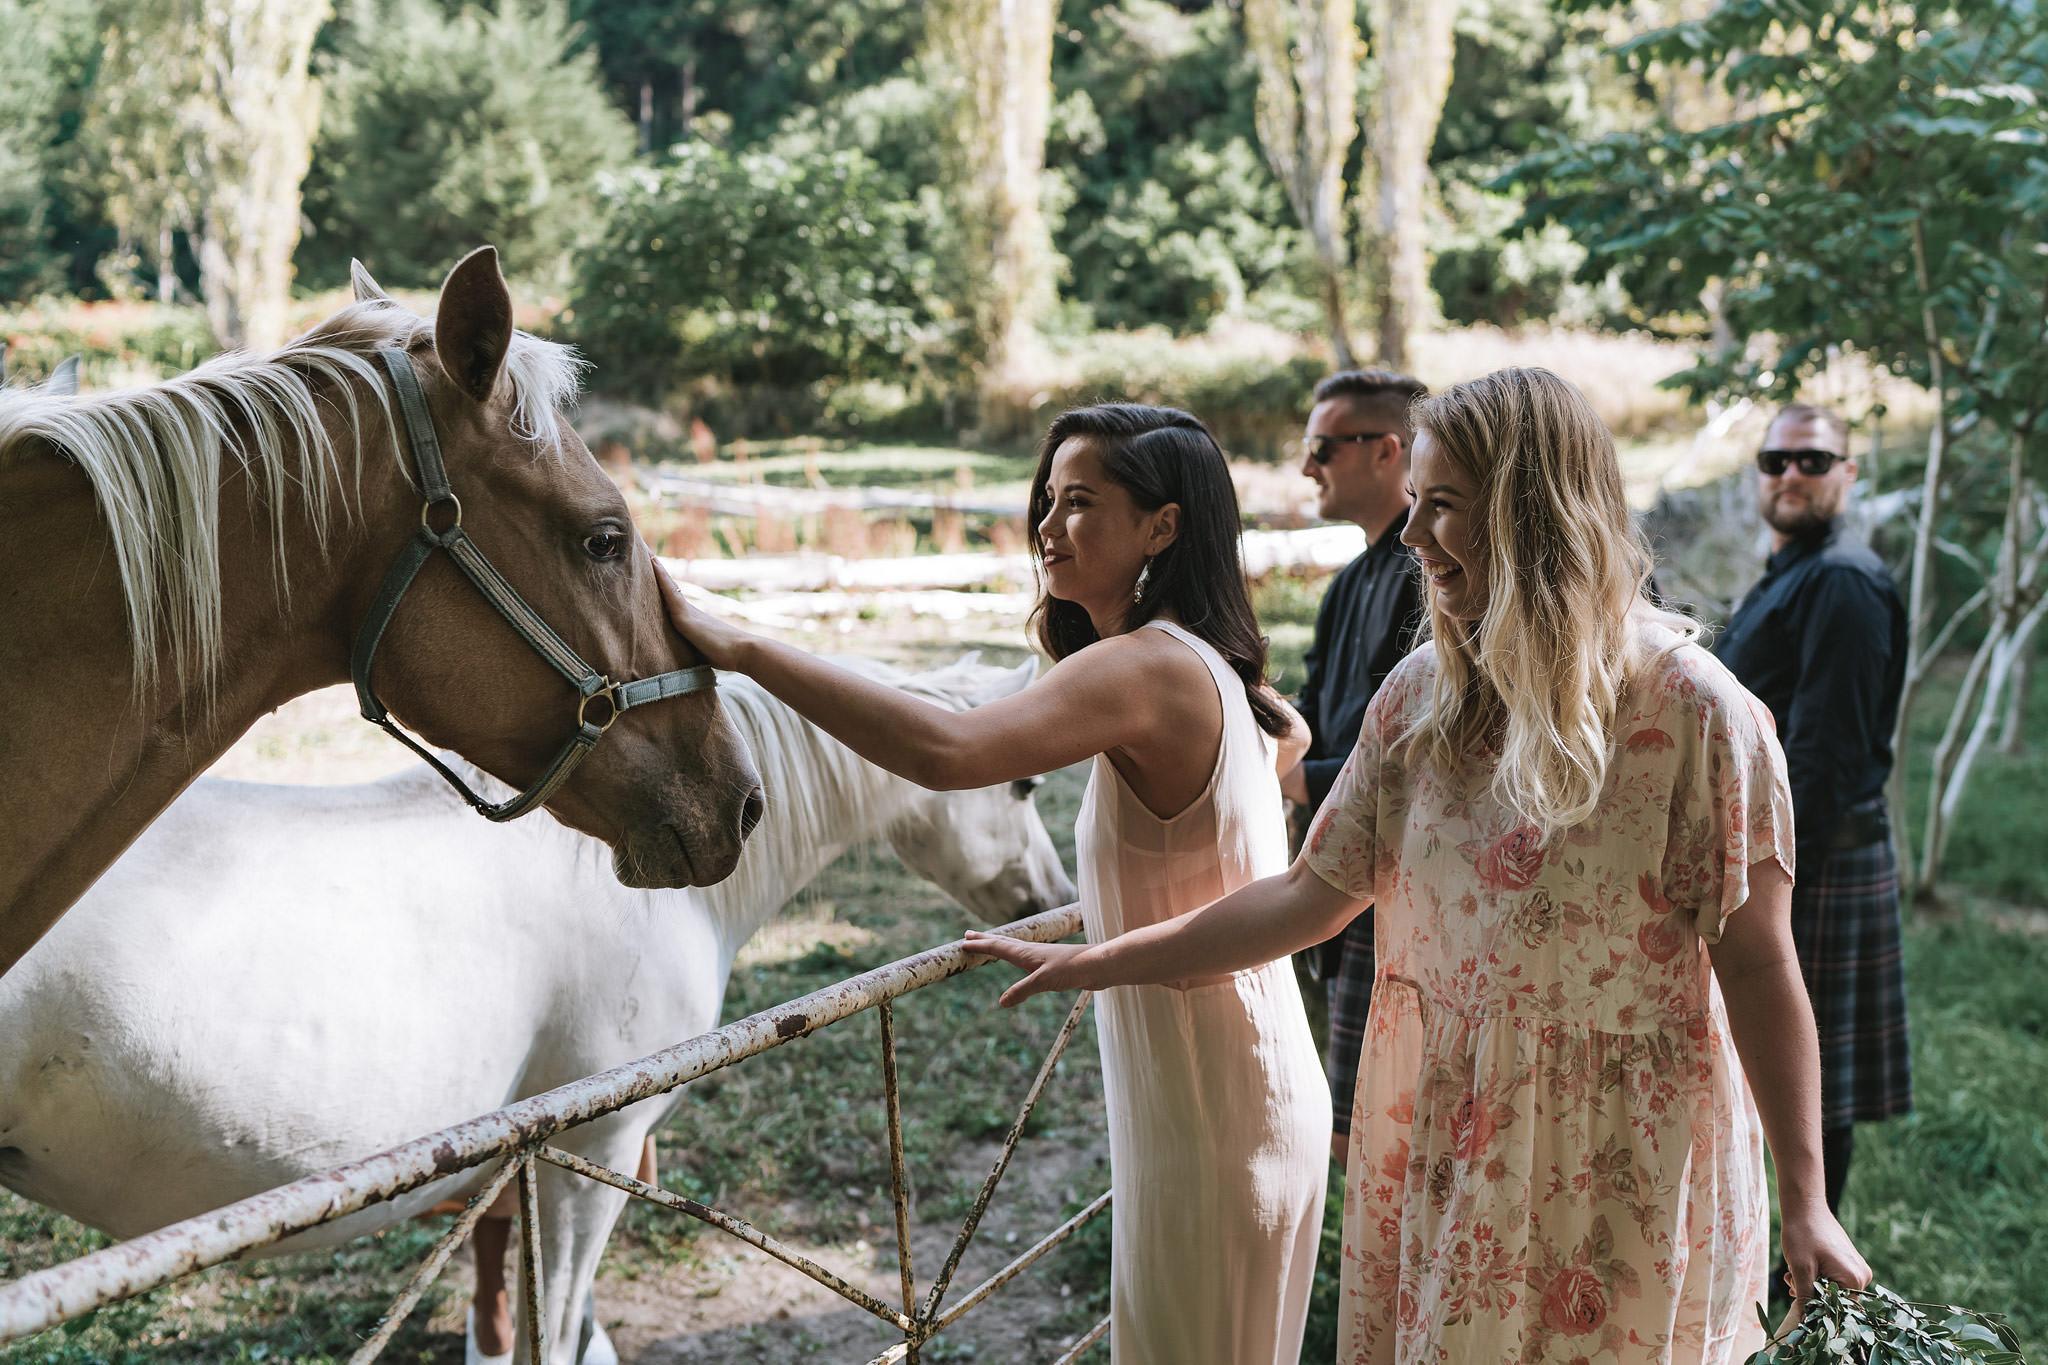 rambo-estrada-natalieryan-old-forest-school-tauranga-wedding-photographers-531-c-copy.jpg